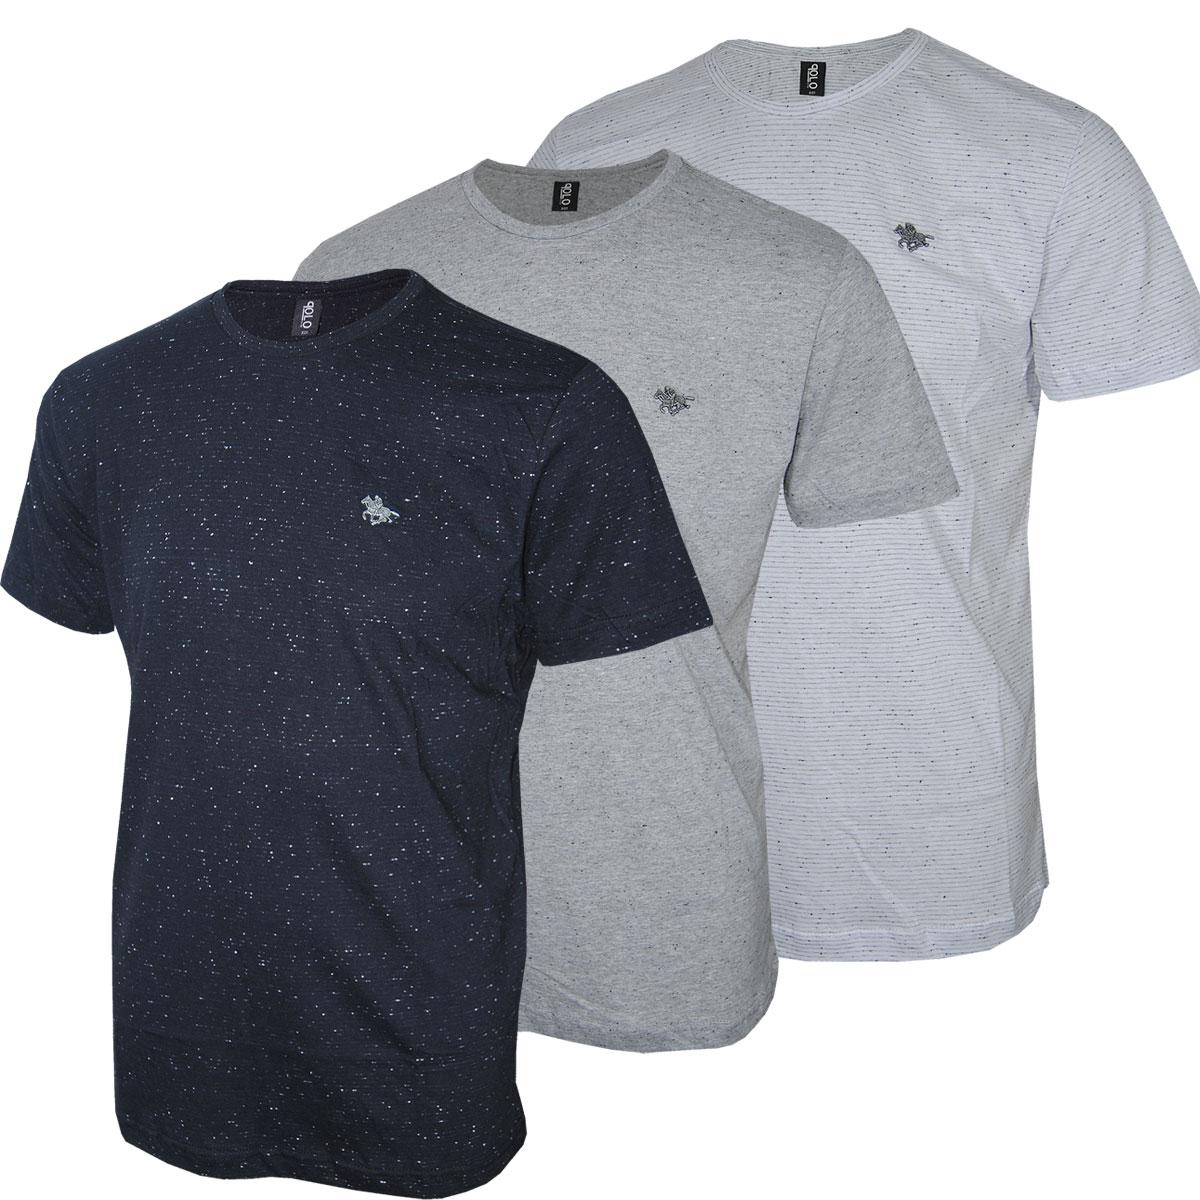 Camiseta Masculina Plus Size com 03 Cores